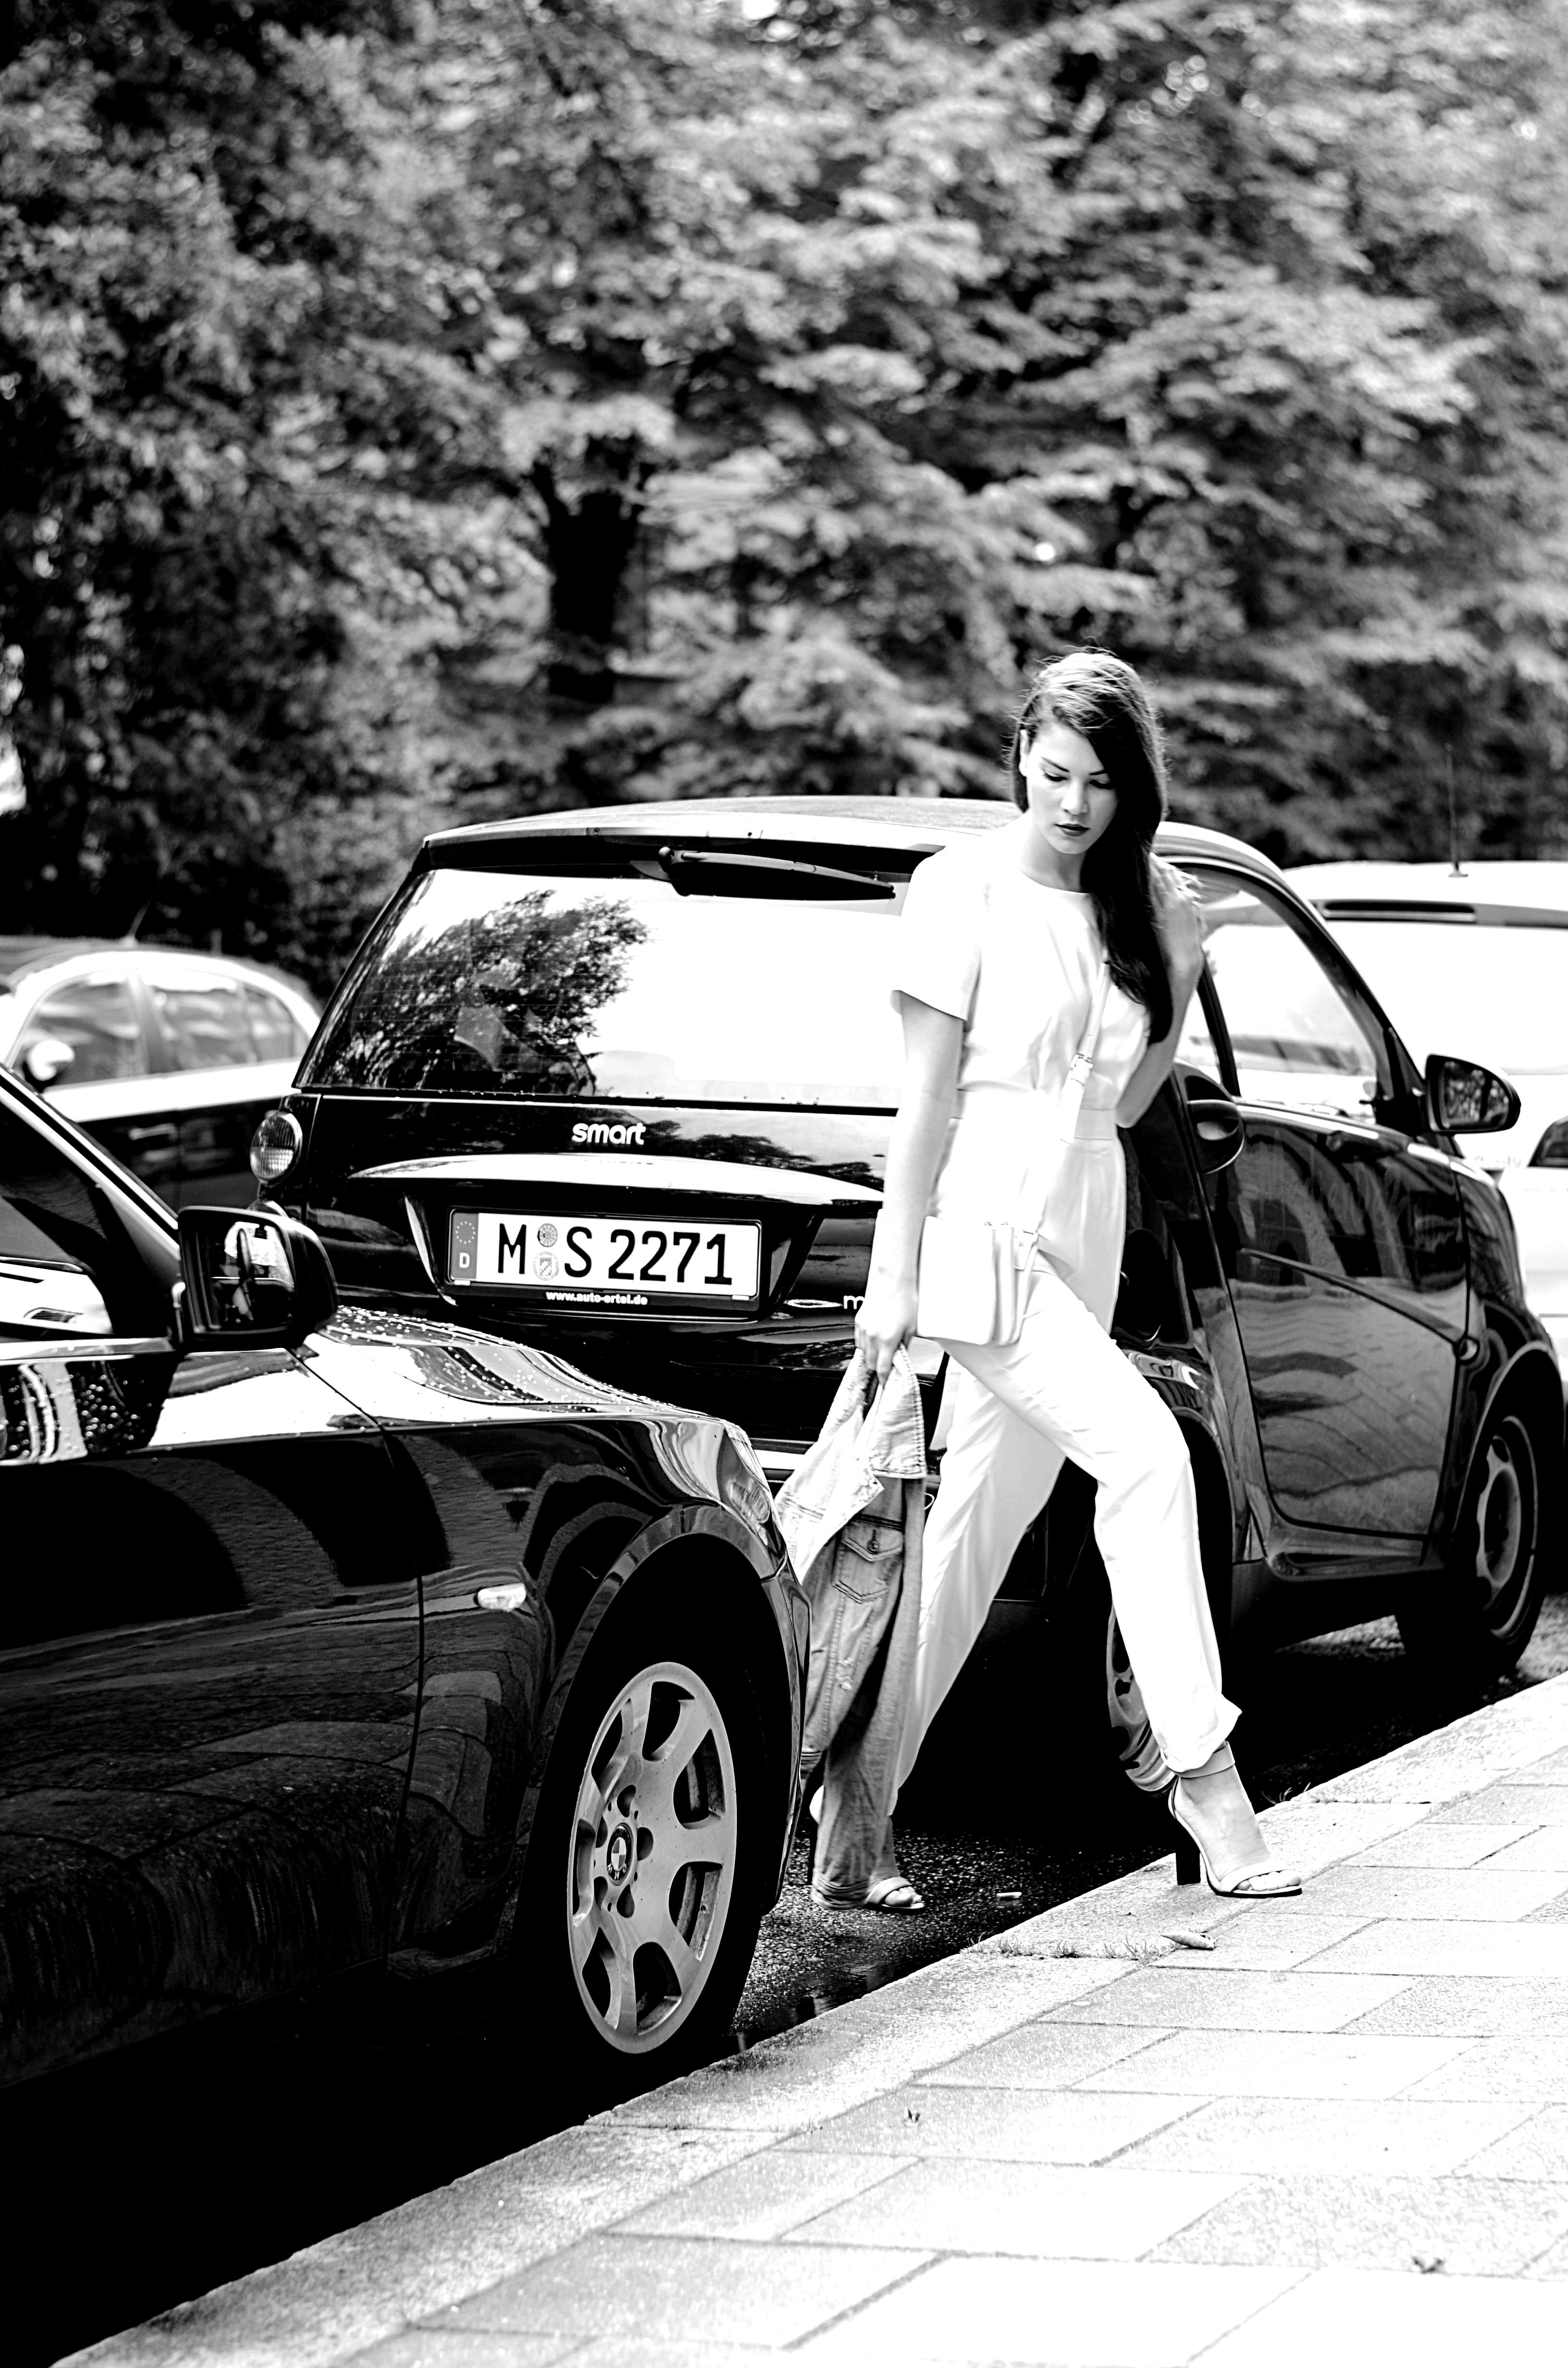 Fashionbloggermünchen-fashionblogger-blogger-fashionblog-münchen-munich-fashion-outfit-mode-style-streetstyle-bloggerstreetstyle-fashiioncarpet-fashioncarpet-look-ootd-fashionblogdeutschland-deutscherfashionblogger-fashionbloggergermany-germanblogger-forever21-kooperation-fashionbloggerkooperation-forever21denim-jeansjacke-stylingjeansjacke-denimjacket-bloggerdenimjacket